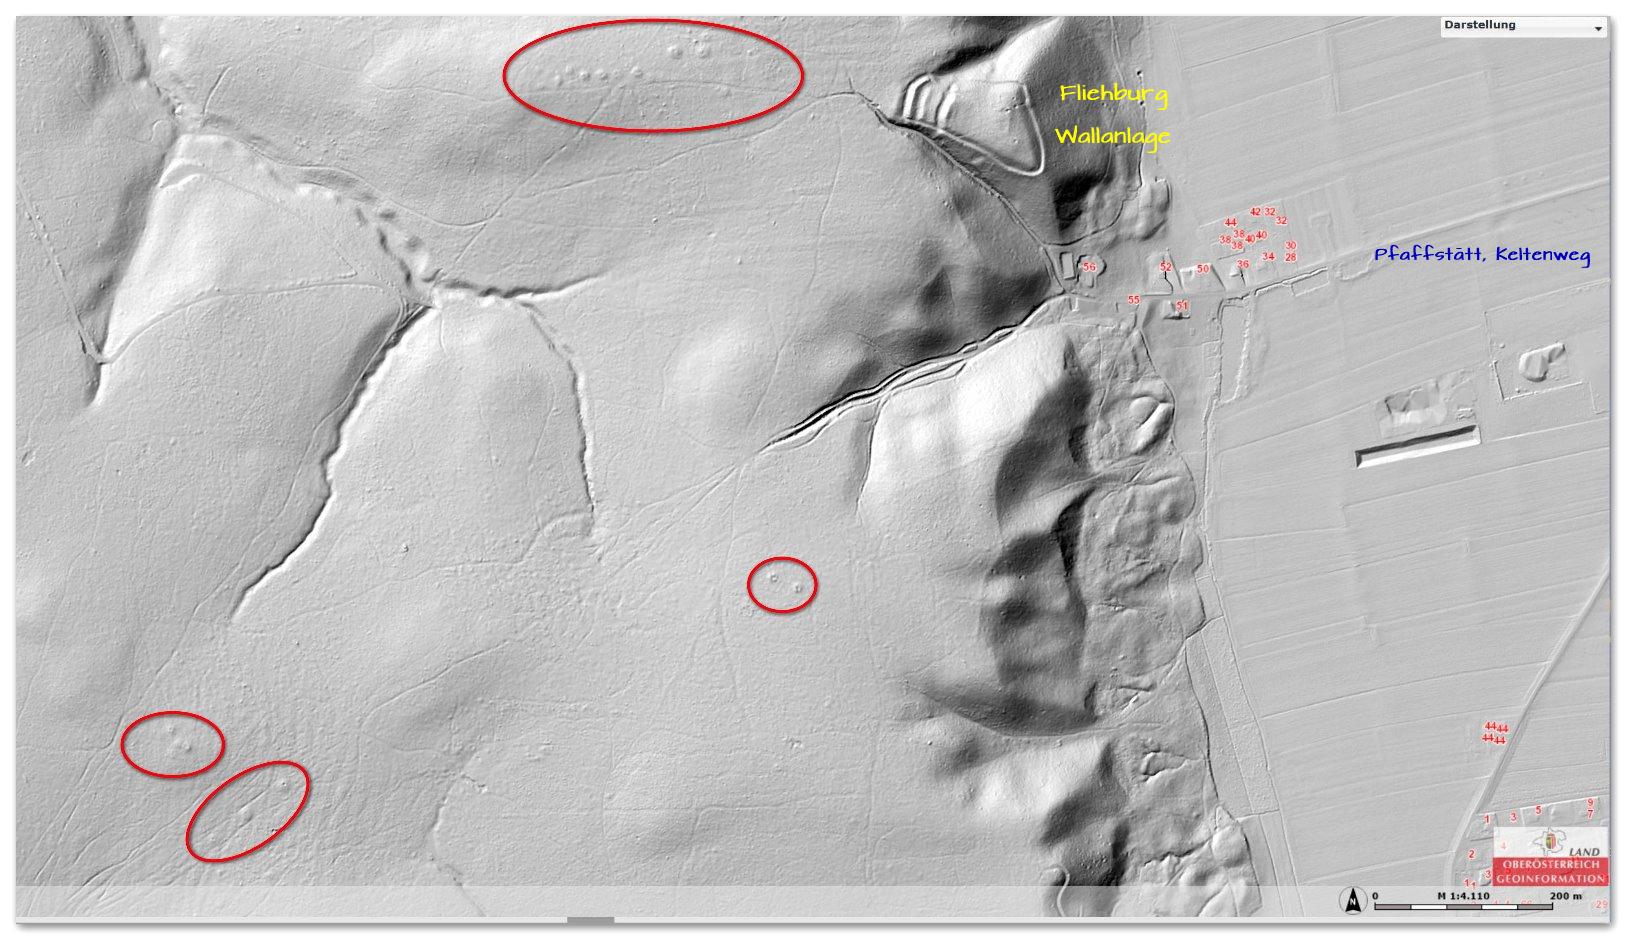 LIDAR-Aufnahme Hügelgräber Siedelberg - Pfaffstätt und Auerbach